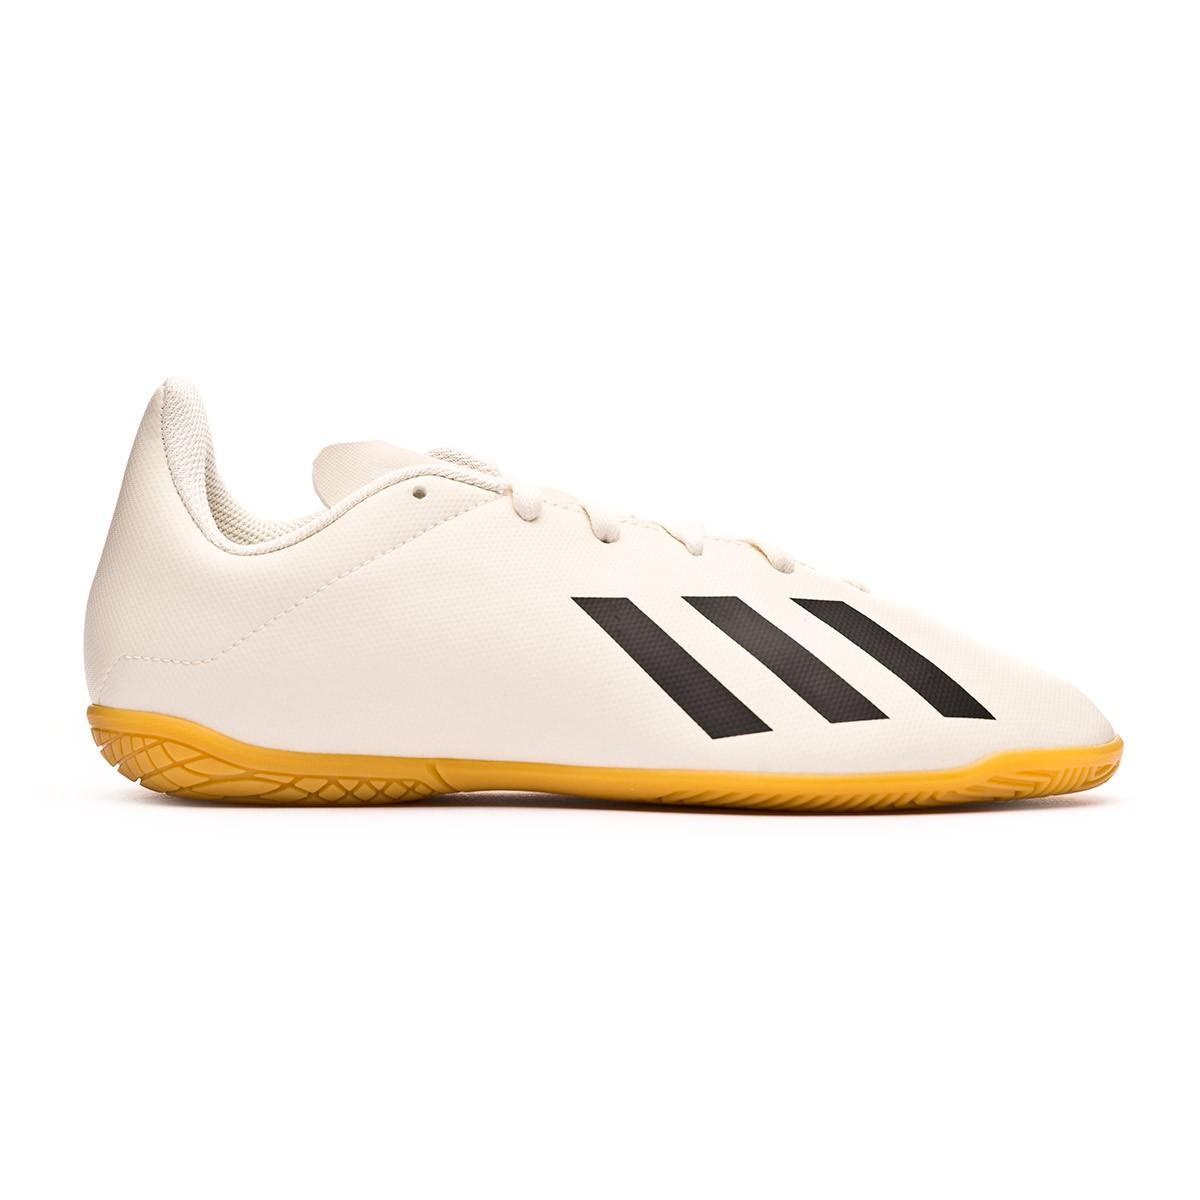 97e4ae610 Futsal Boot adidas Kids X Tango 18.4 IN Off white-White-Core black -  Football store Fútbol Emotion